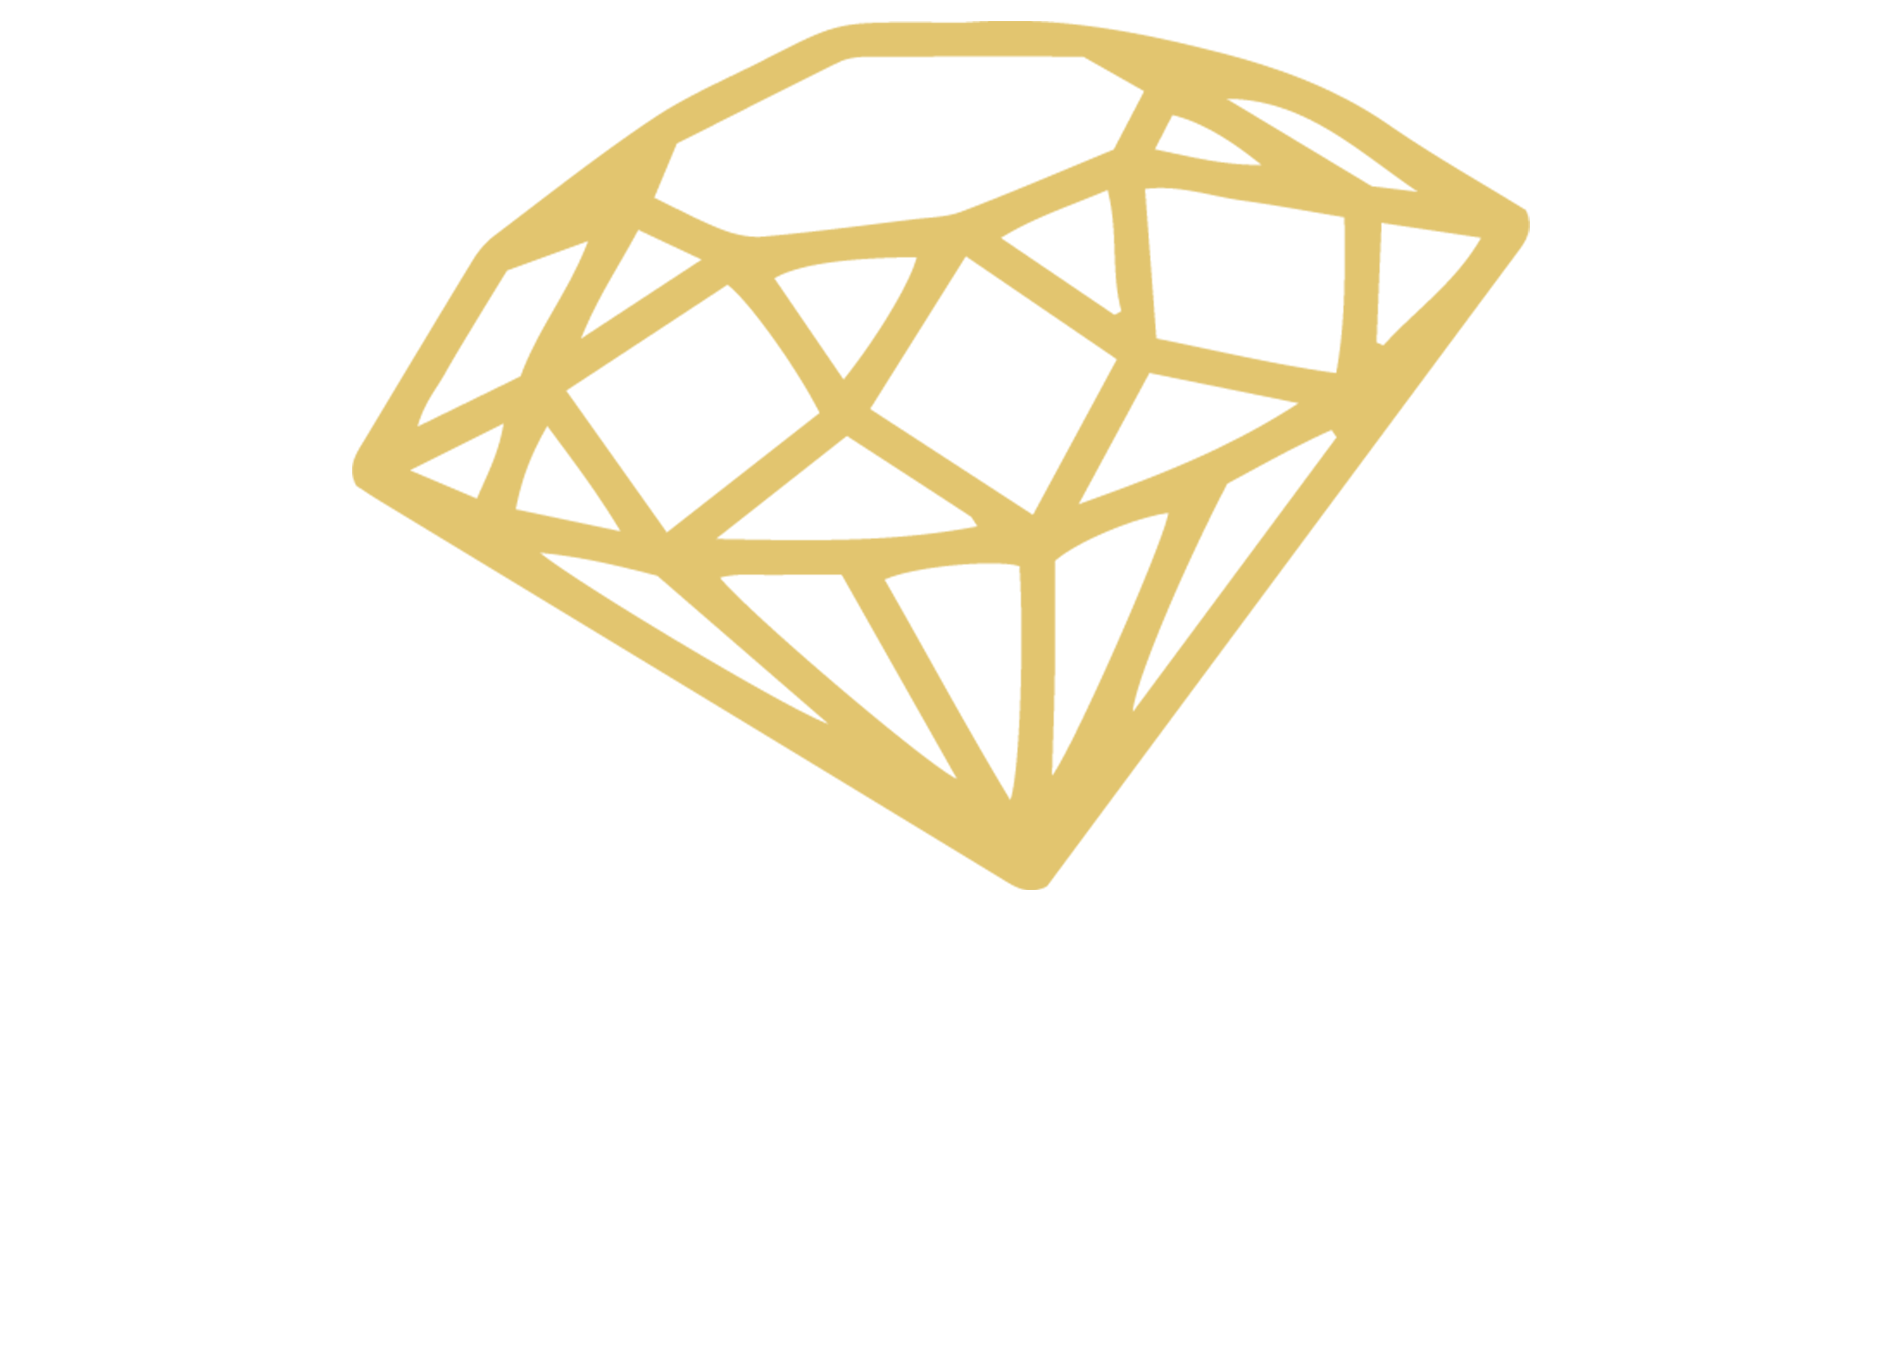 Diamond Beachwear